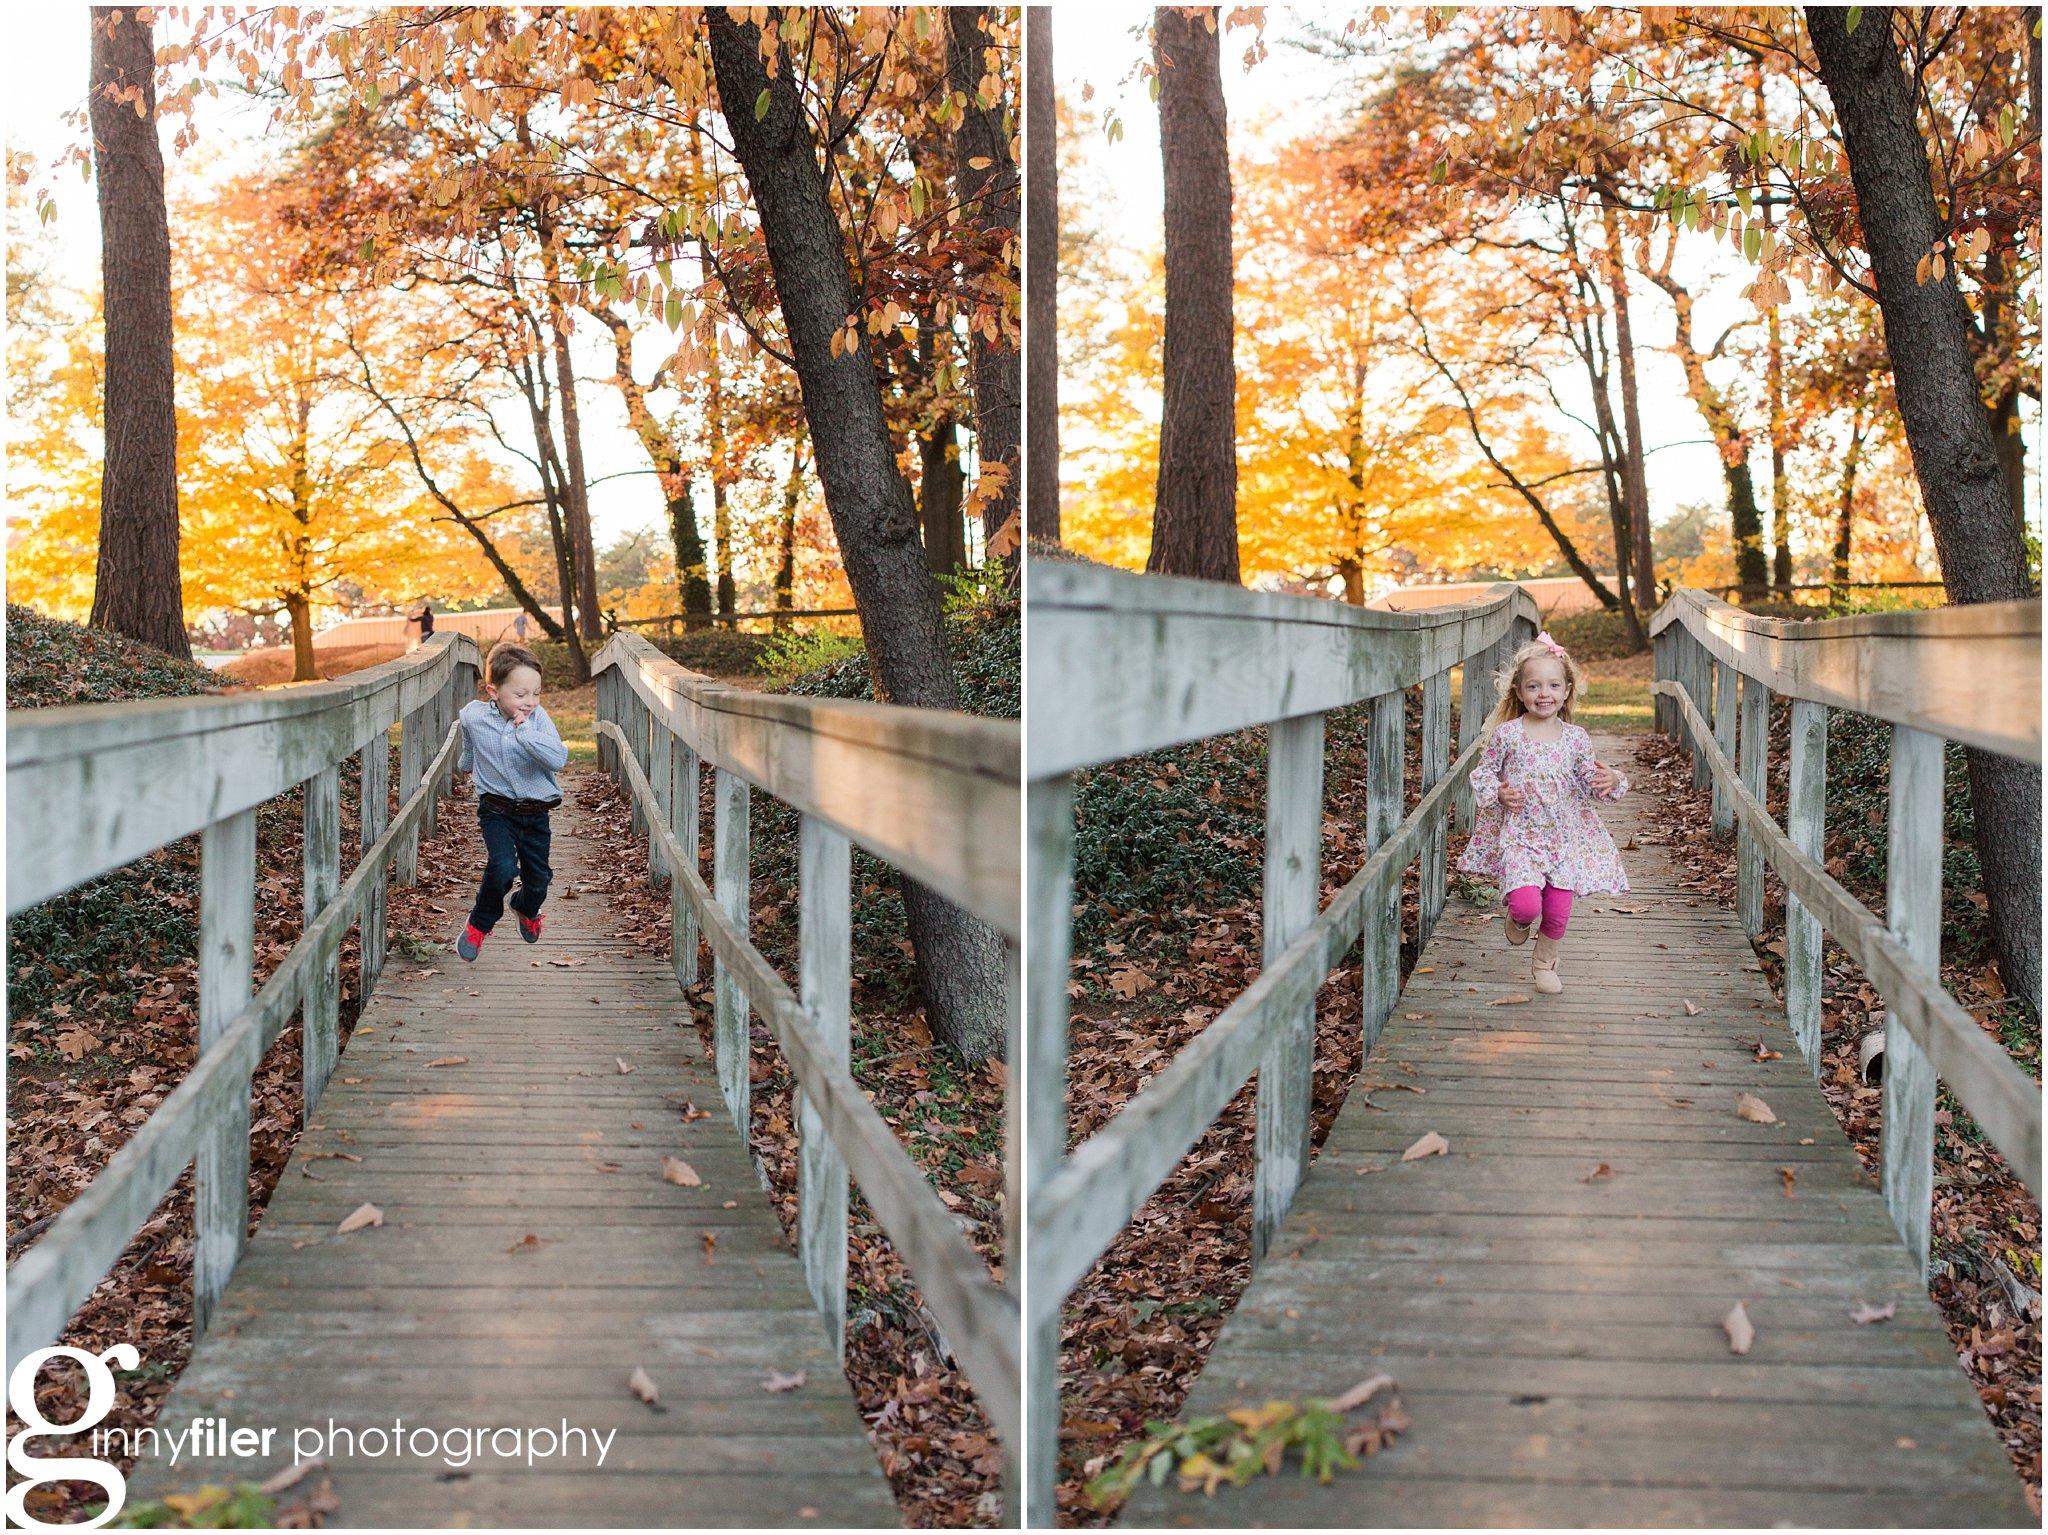 family_photography_Kennedy_0003.jpg